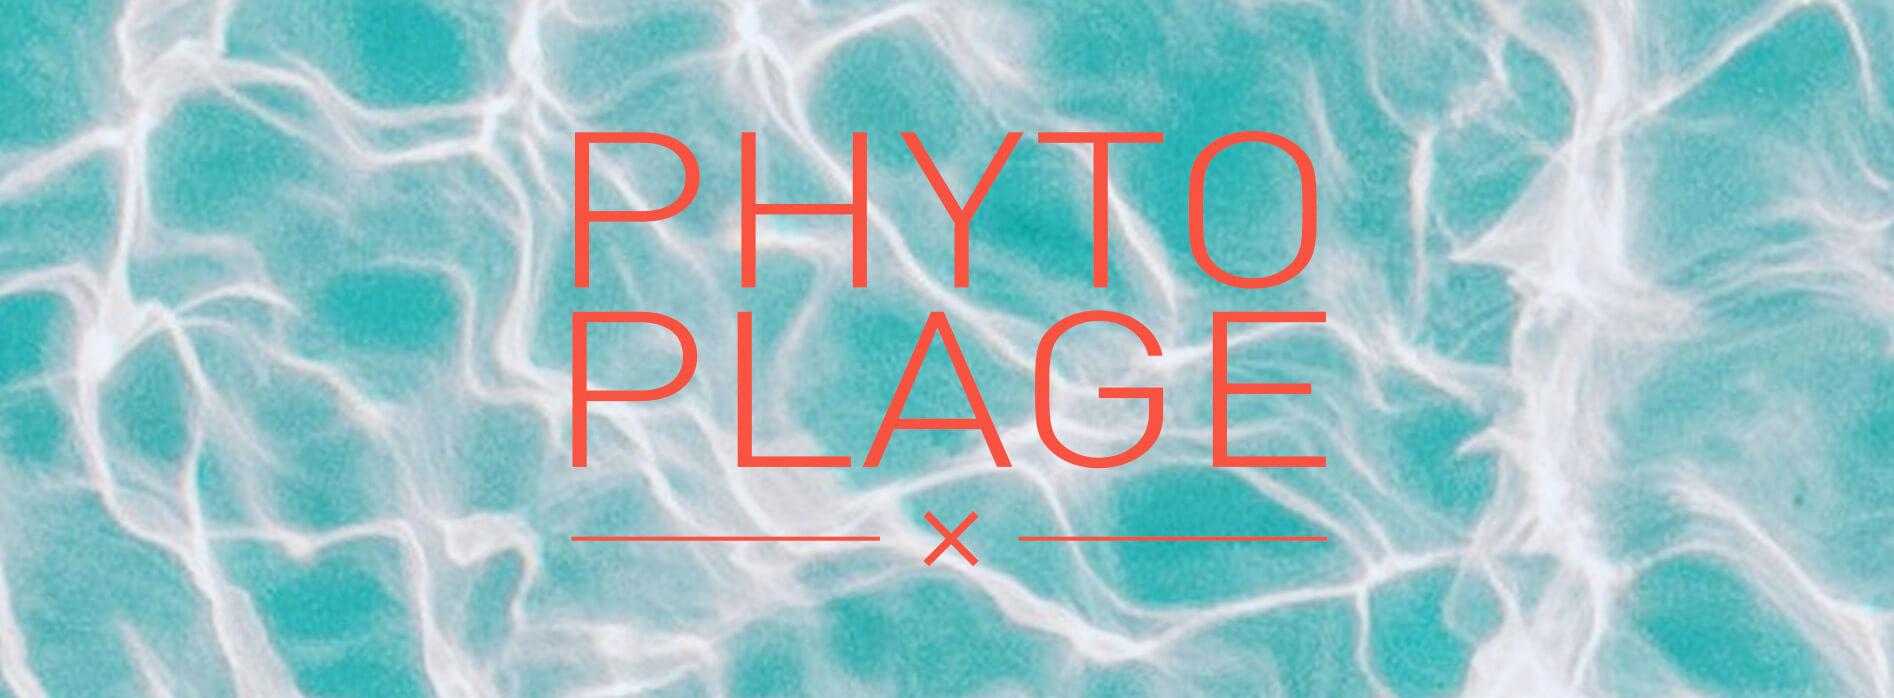 Phytoplage